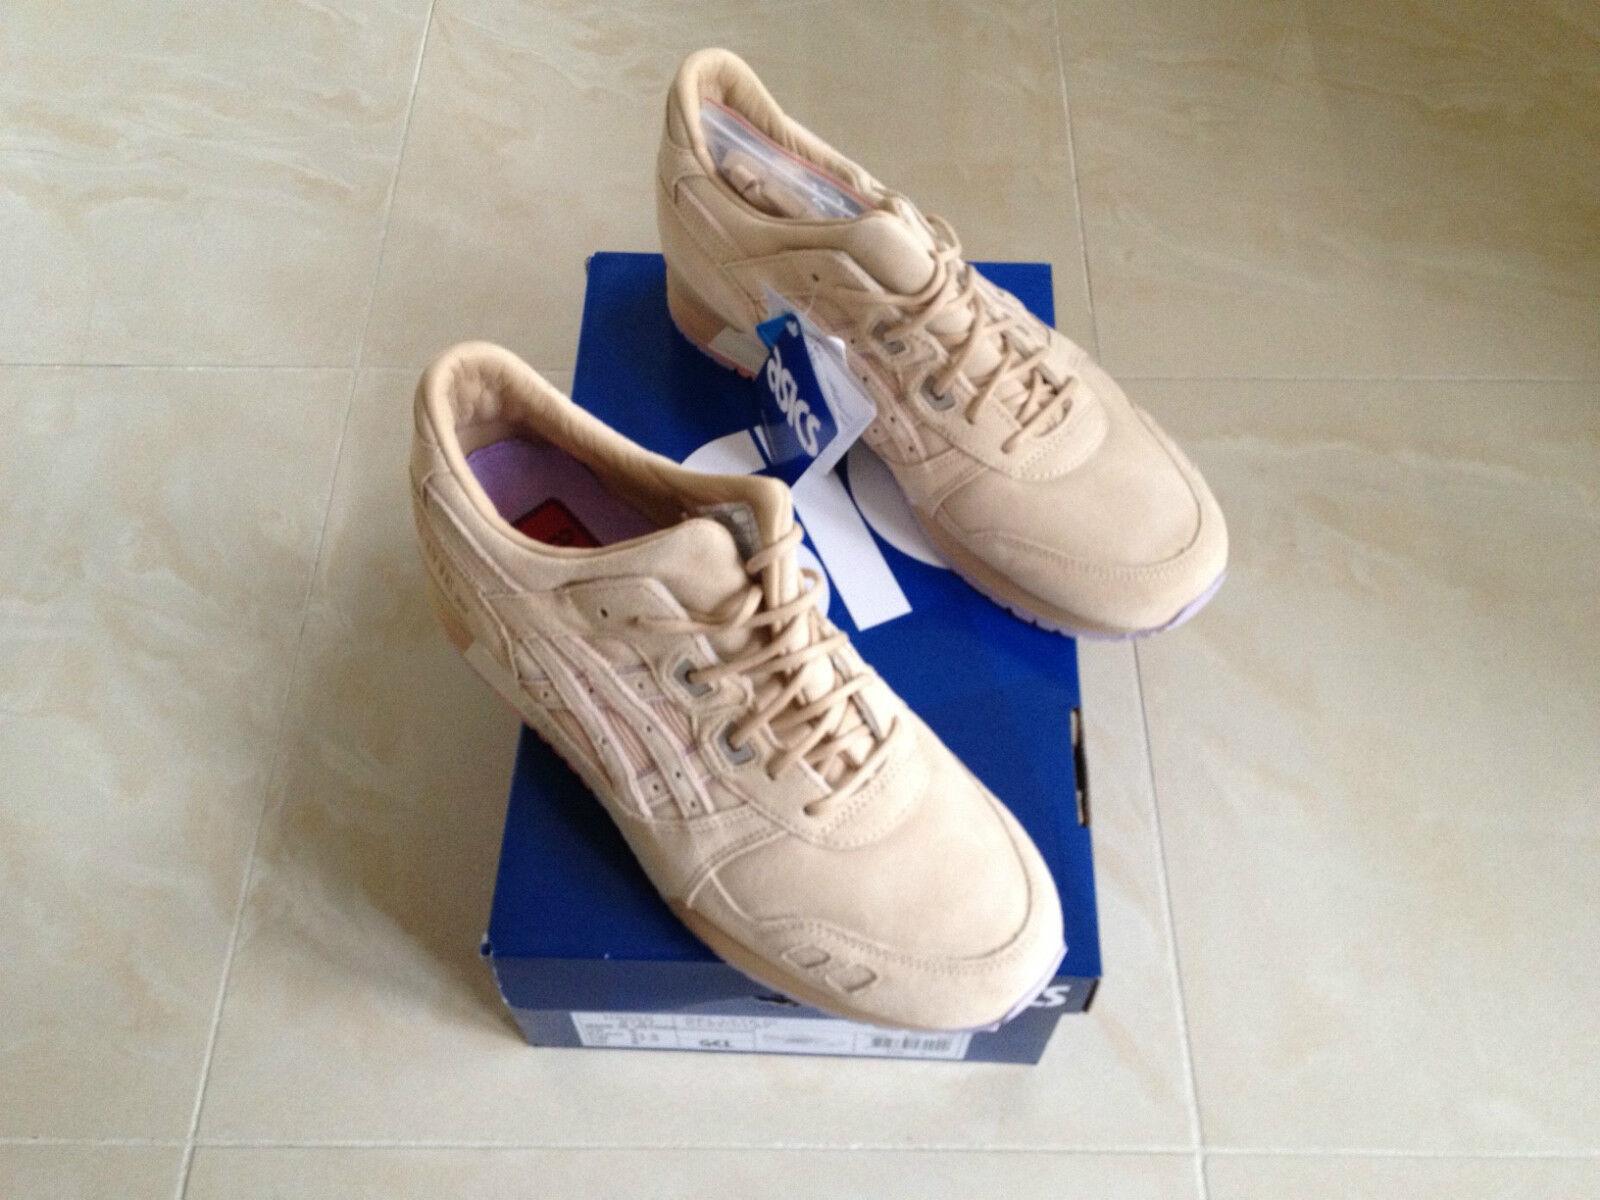 ASICS X CLOT CLOT CLOT Gel Lyte 3 III Clay Sand SIzes & 8.5 NEW LOOK 6e7b20